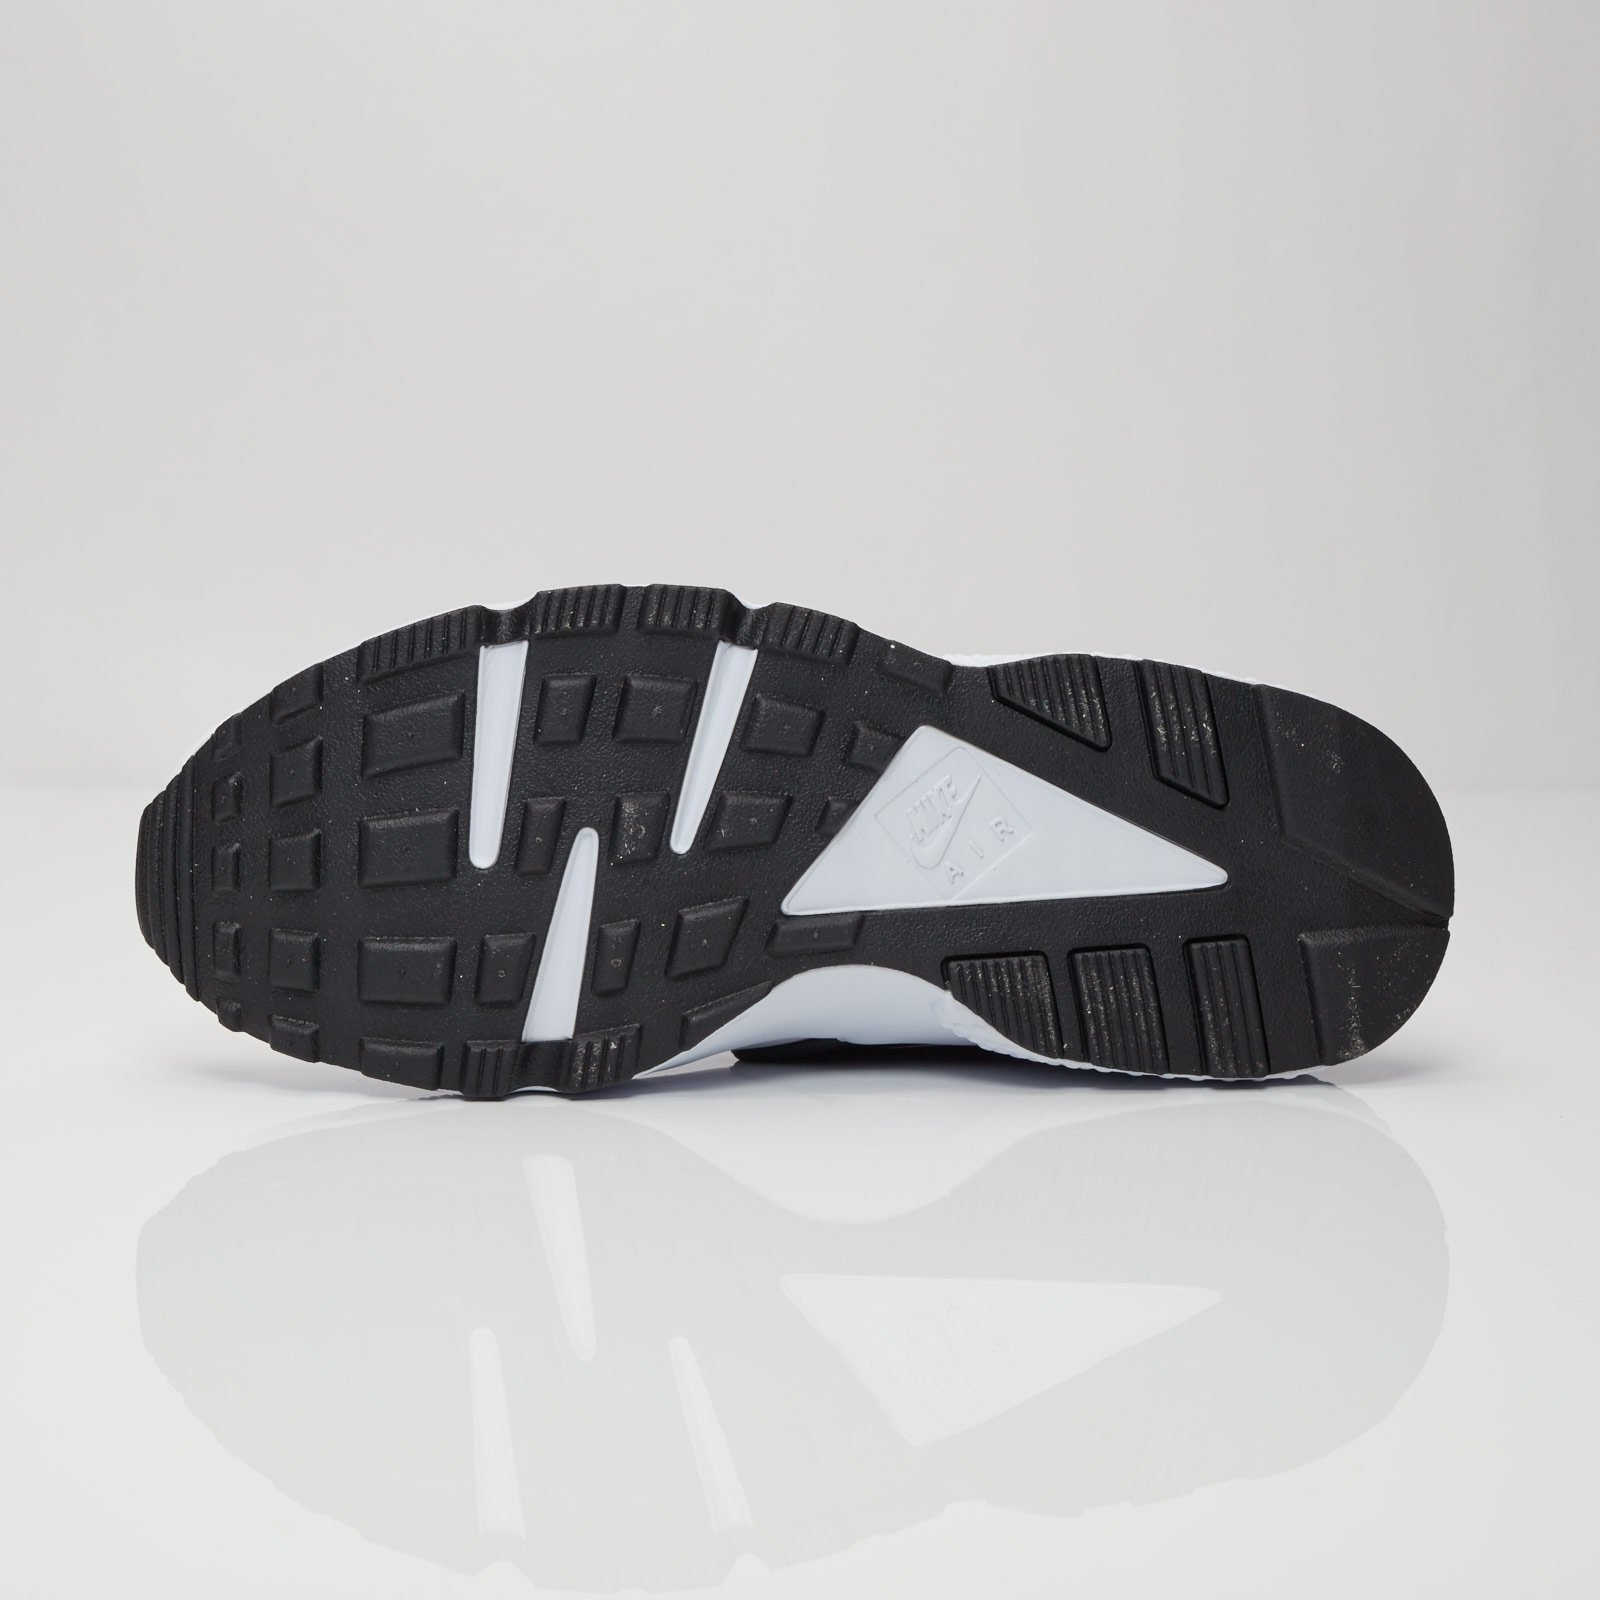 finest selection 6a3b4 a6301 Nike Air Huarache - 318429-105 - Sneakersnstuff   sneakers   streetwear  online since 1999